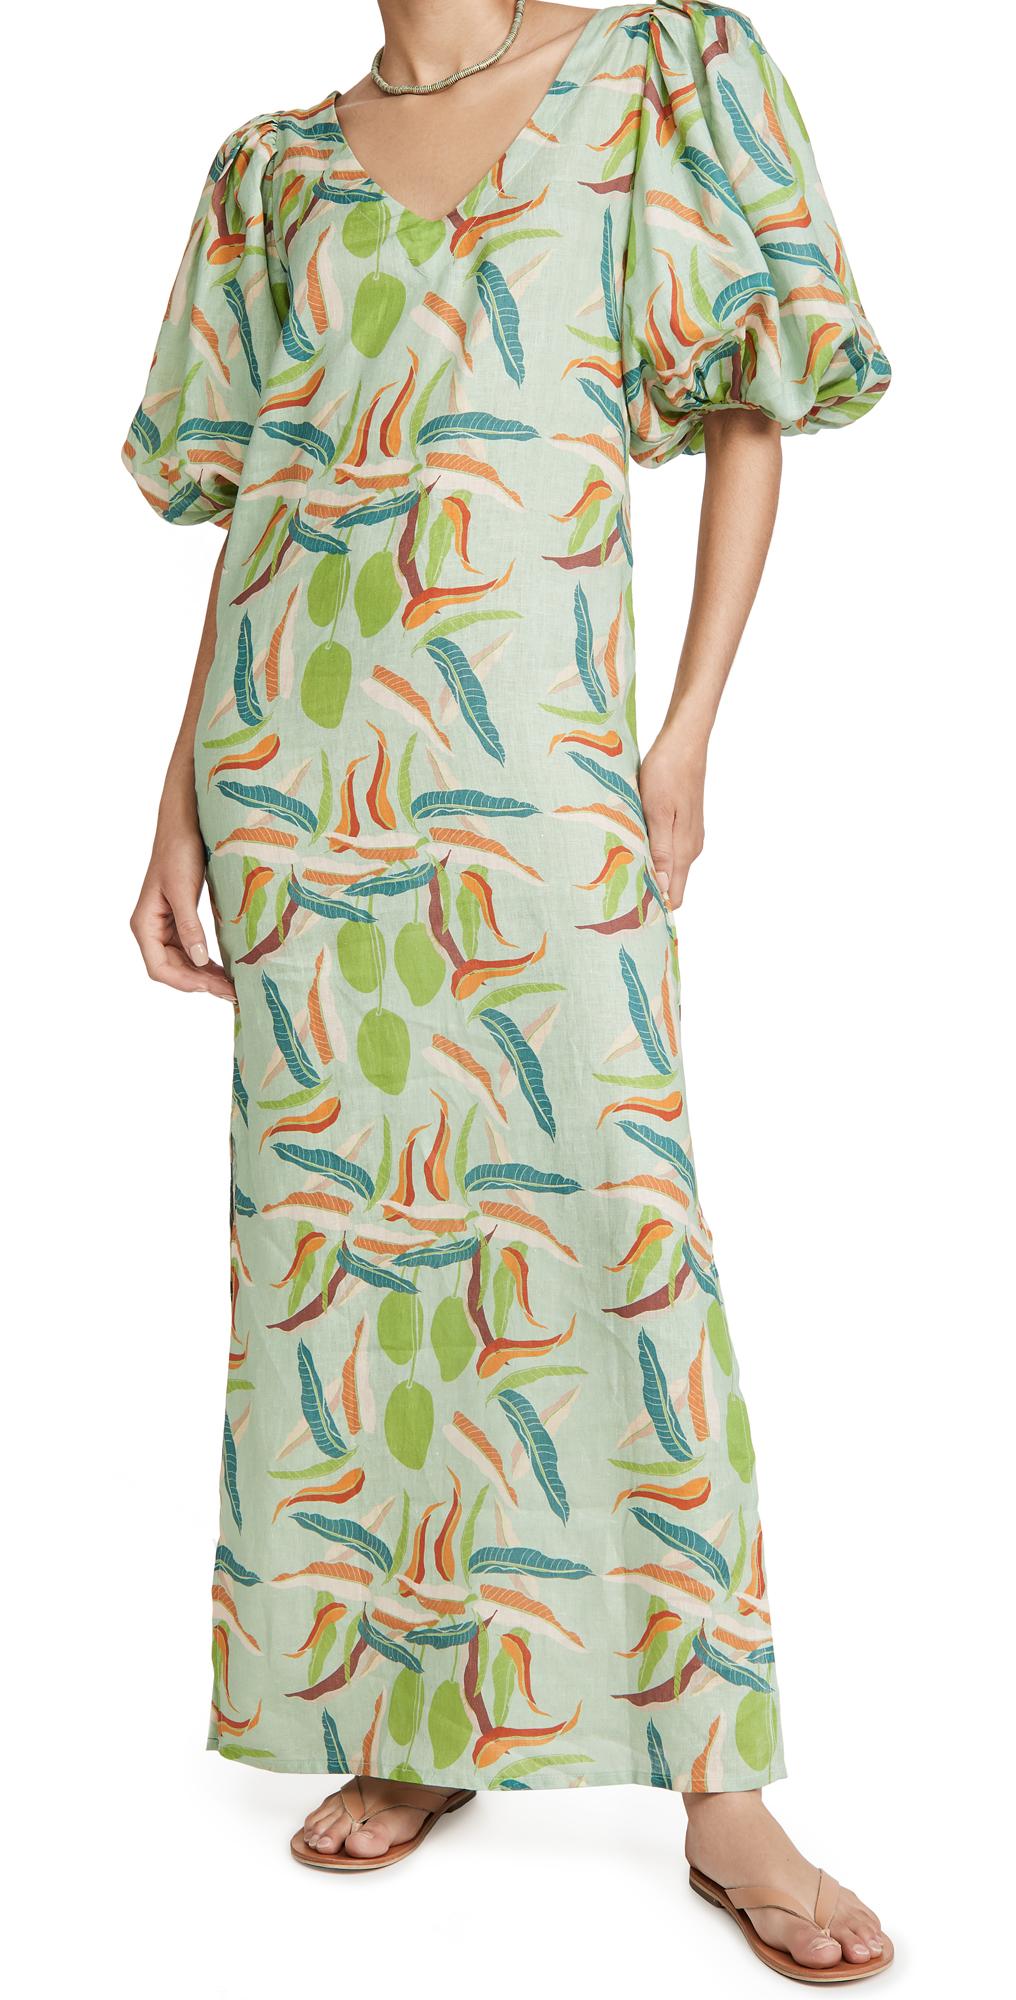 Guayacan Dress